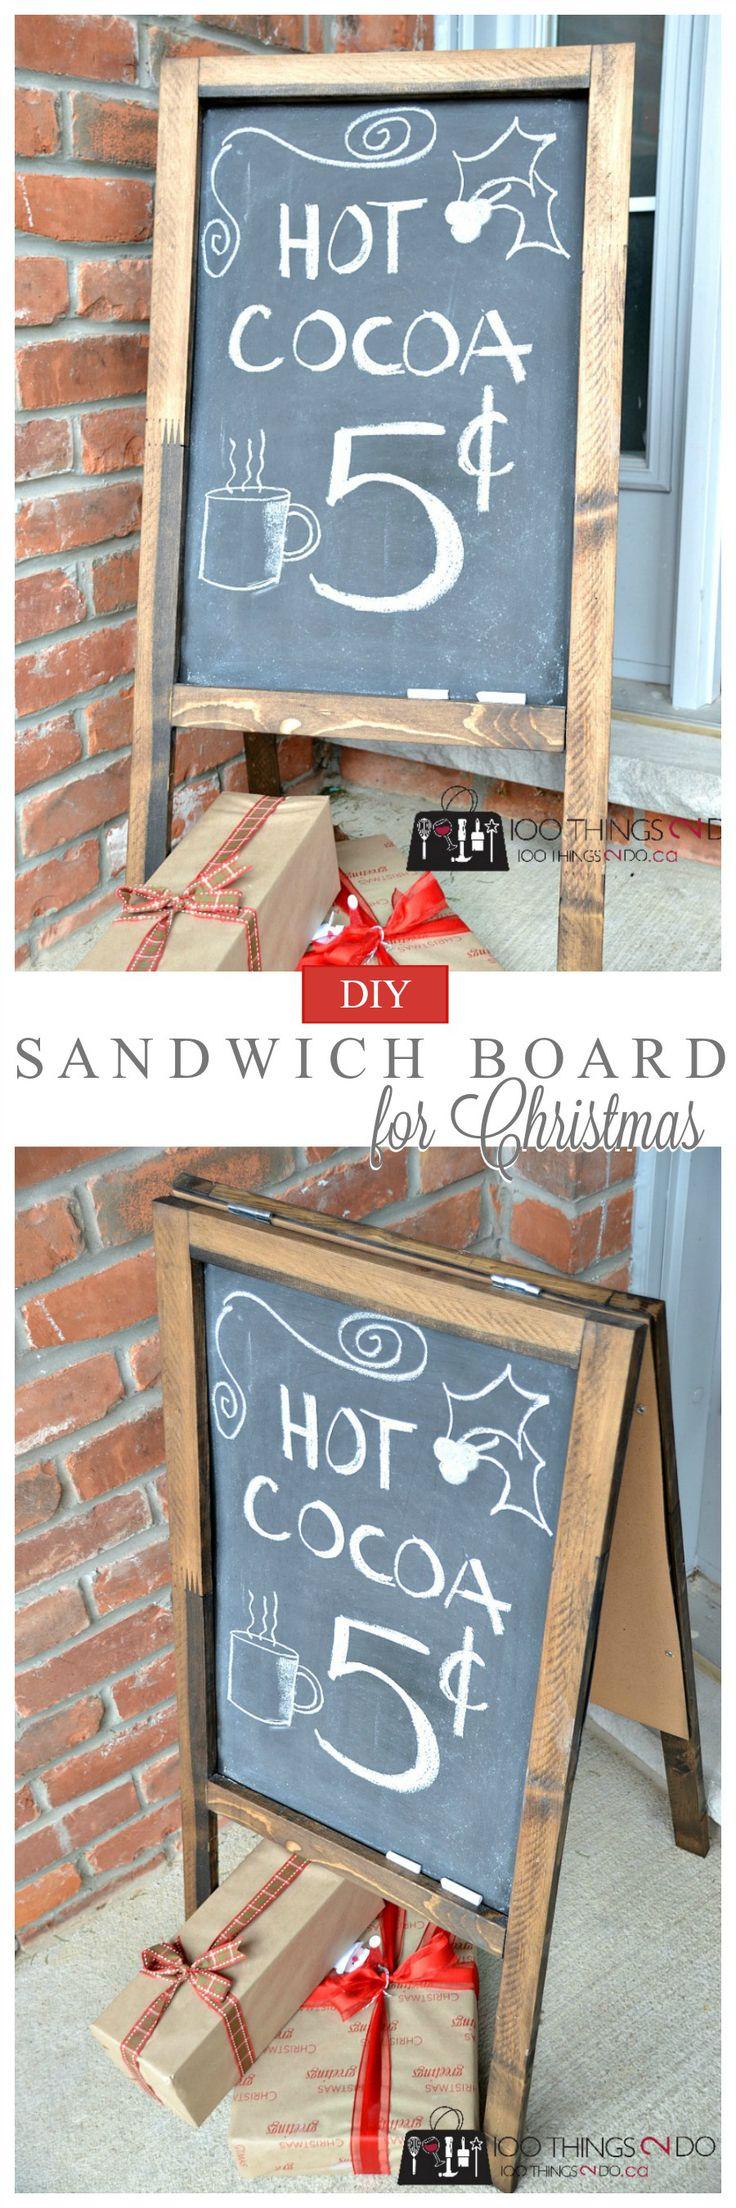 diy sandwich board - Sign Design Ideas